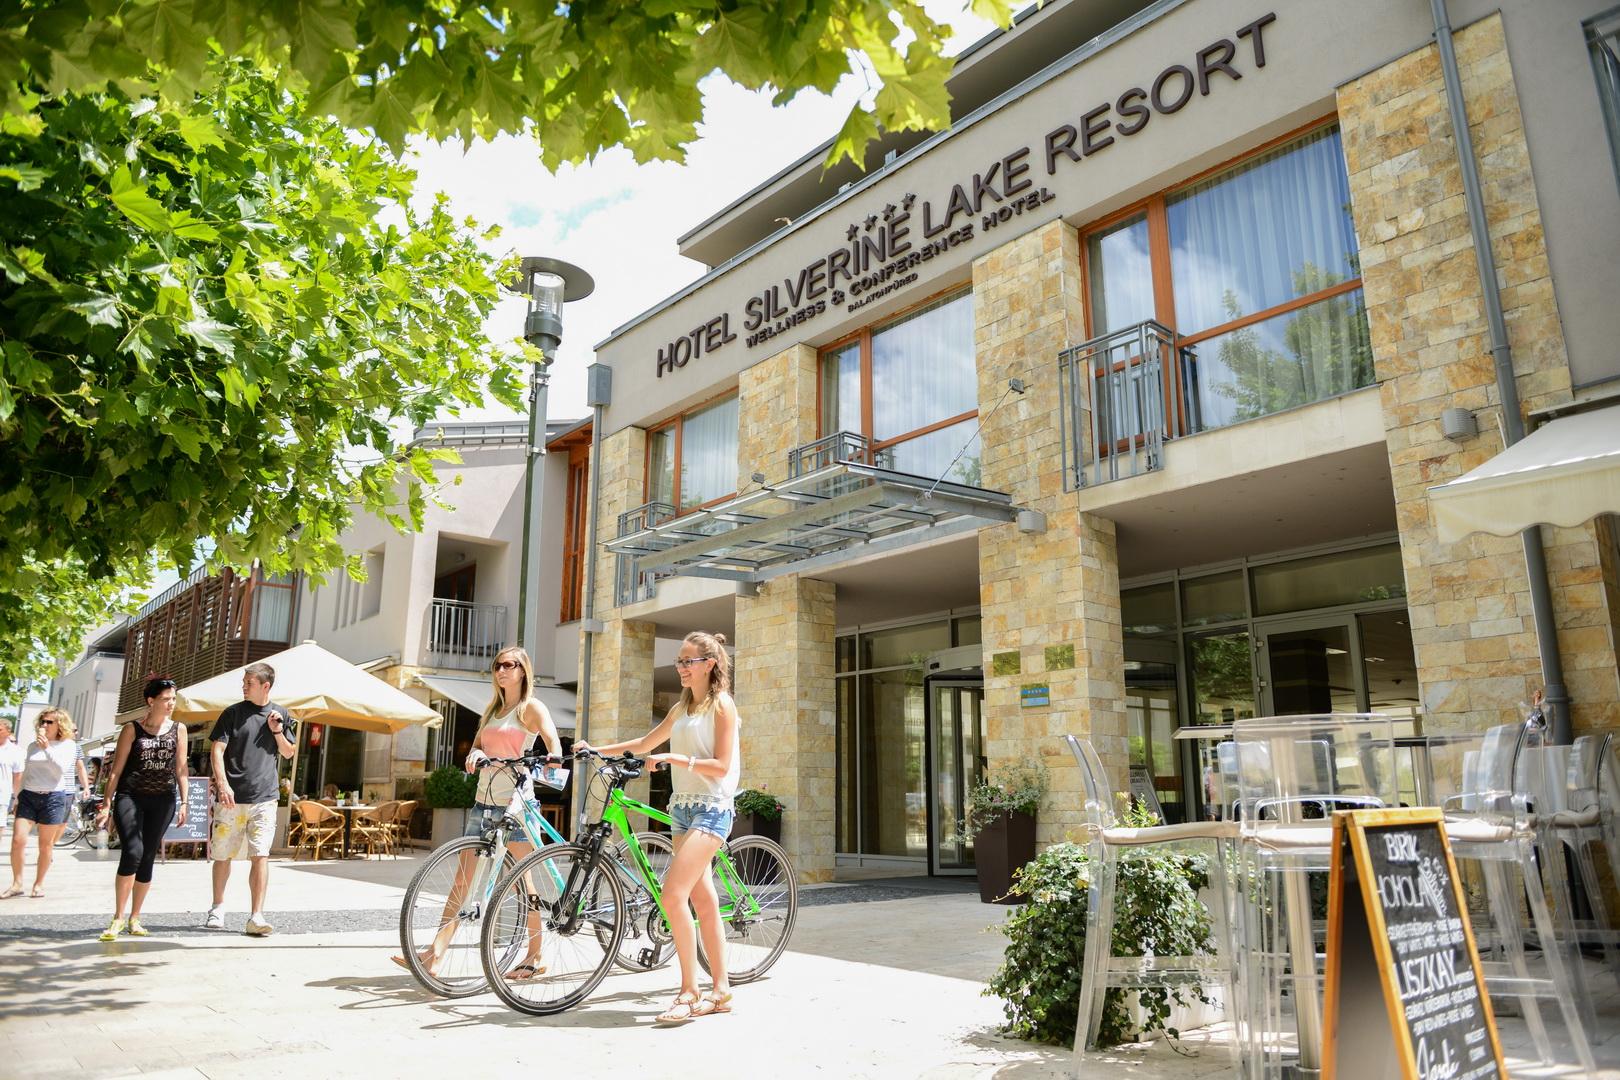 A Hotel Silverine Lake Resort lett a közönségkedvenc balatoni hotel